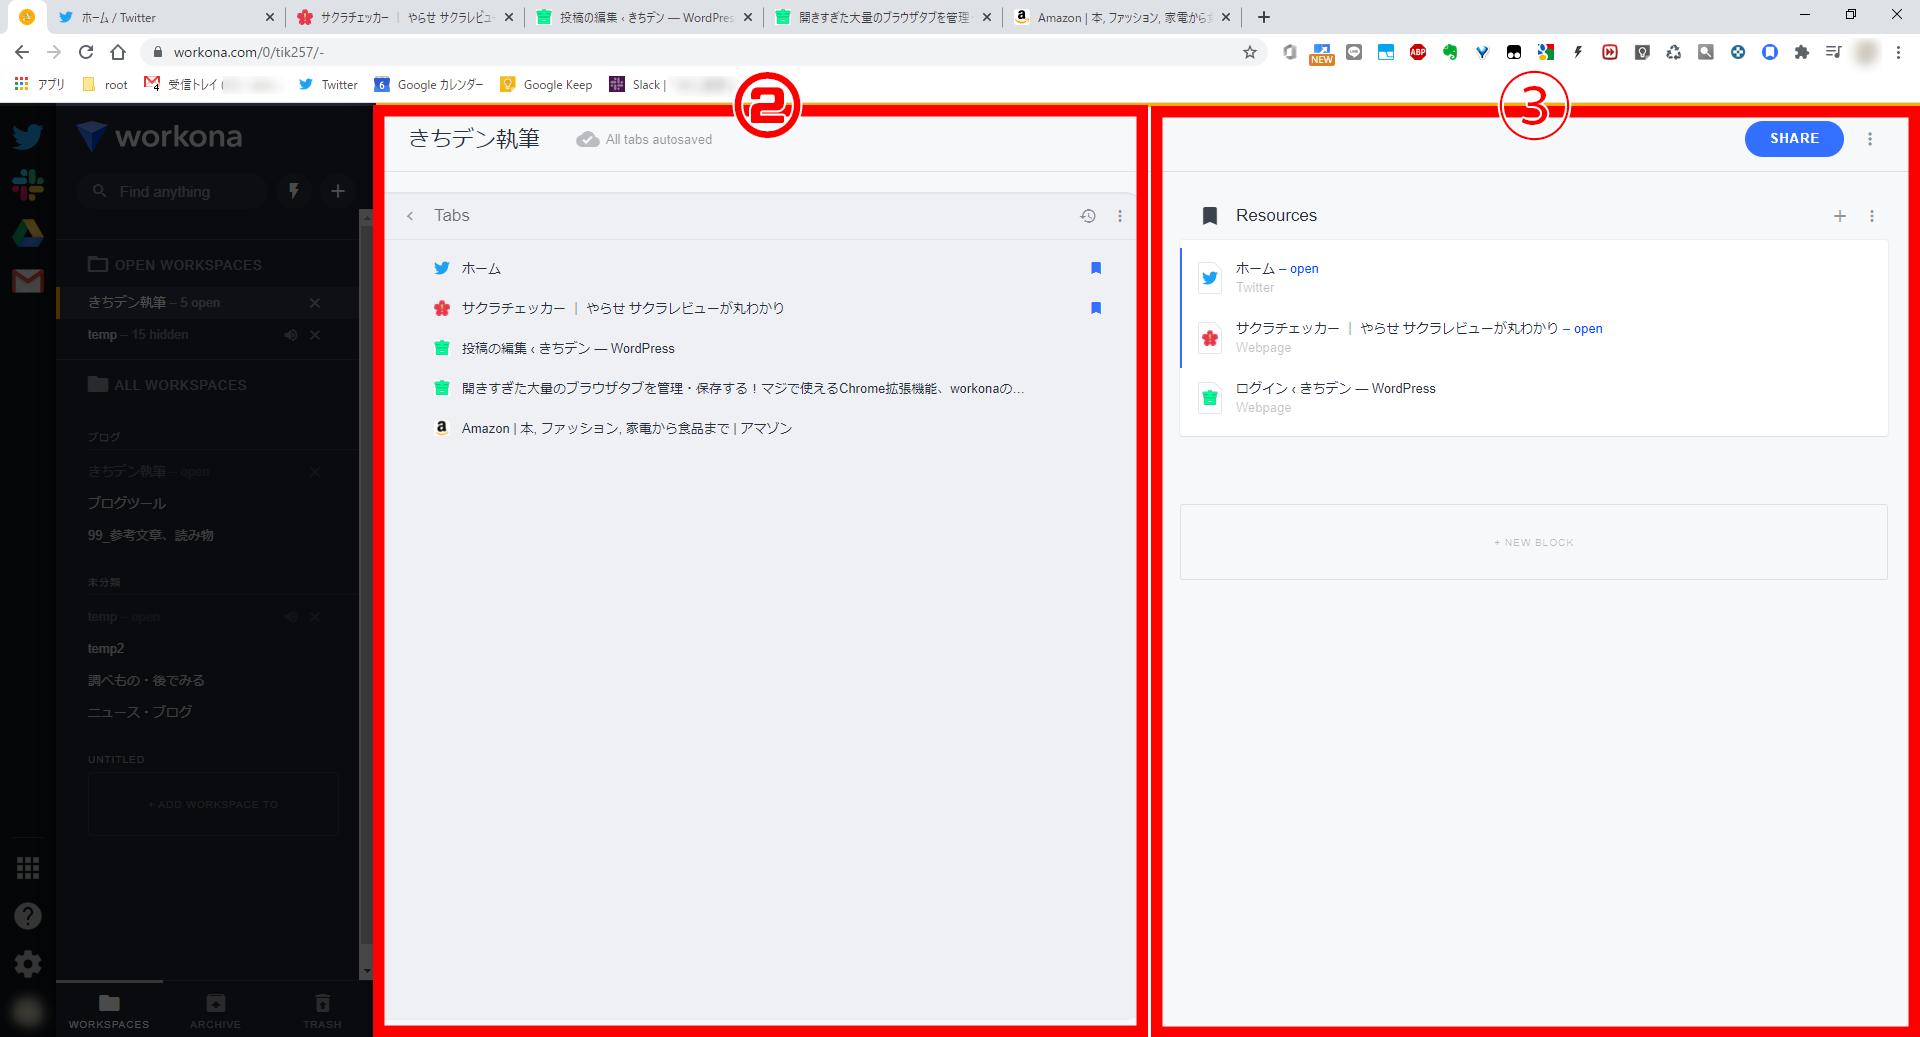 ▲WORKSPACEに開かれたページを管理する箇所(クリックで拡大)